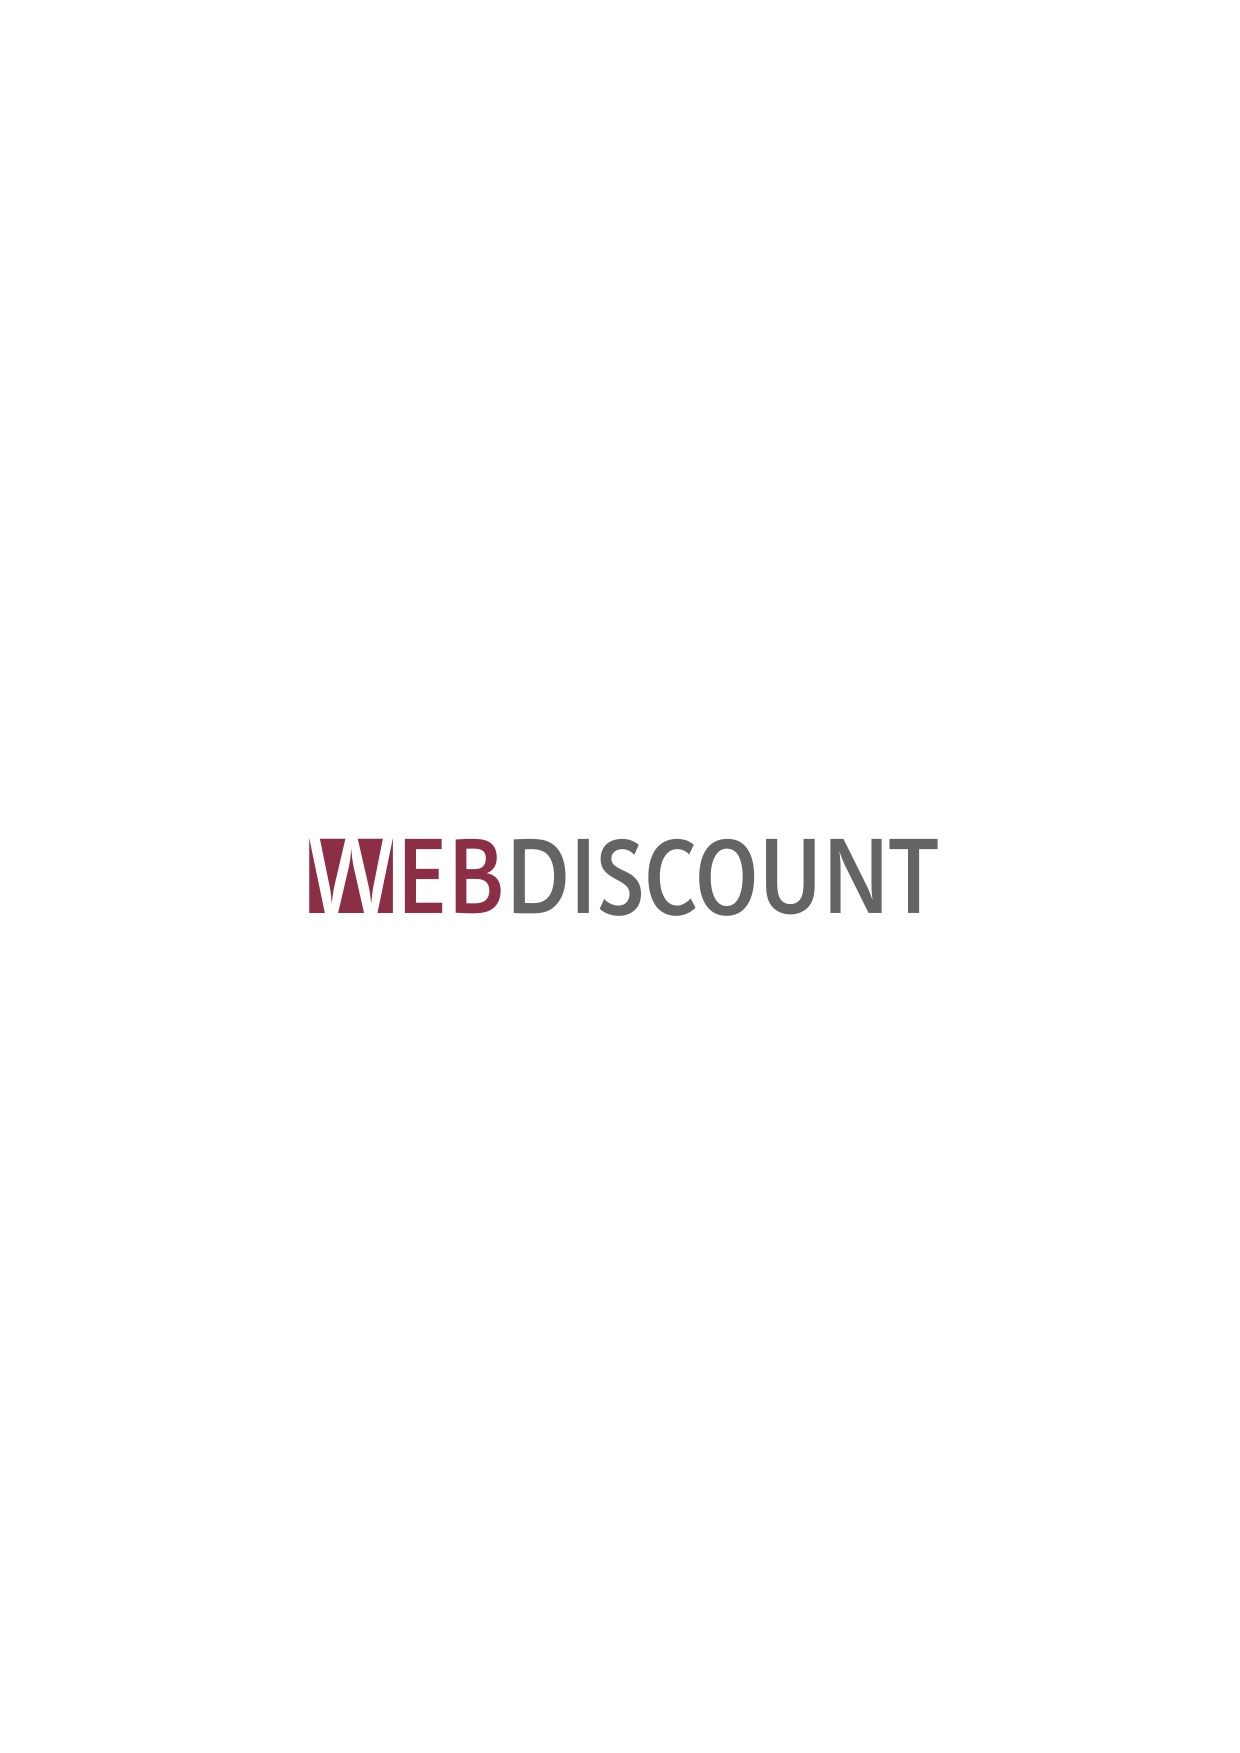 webdiscount